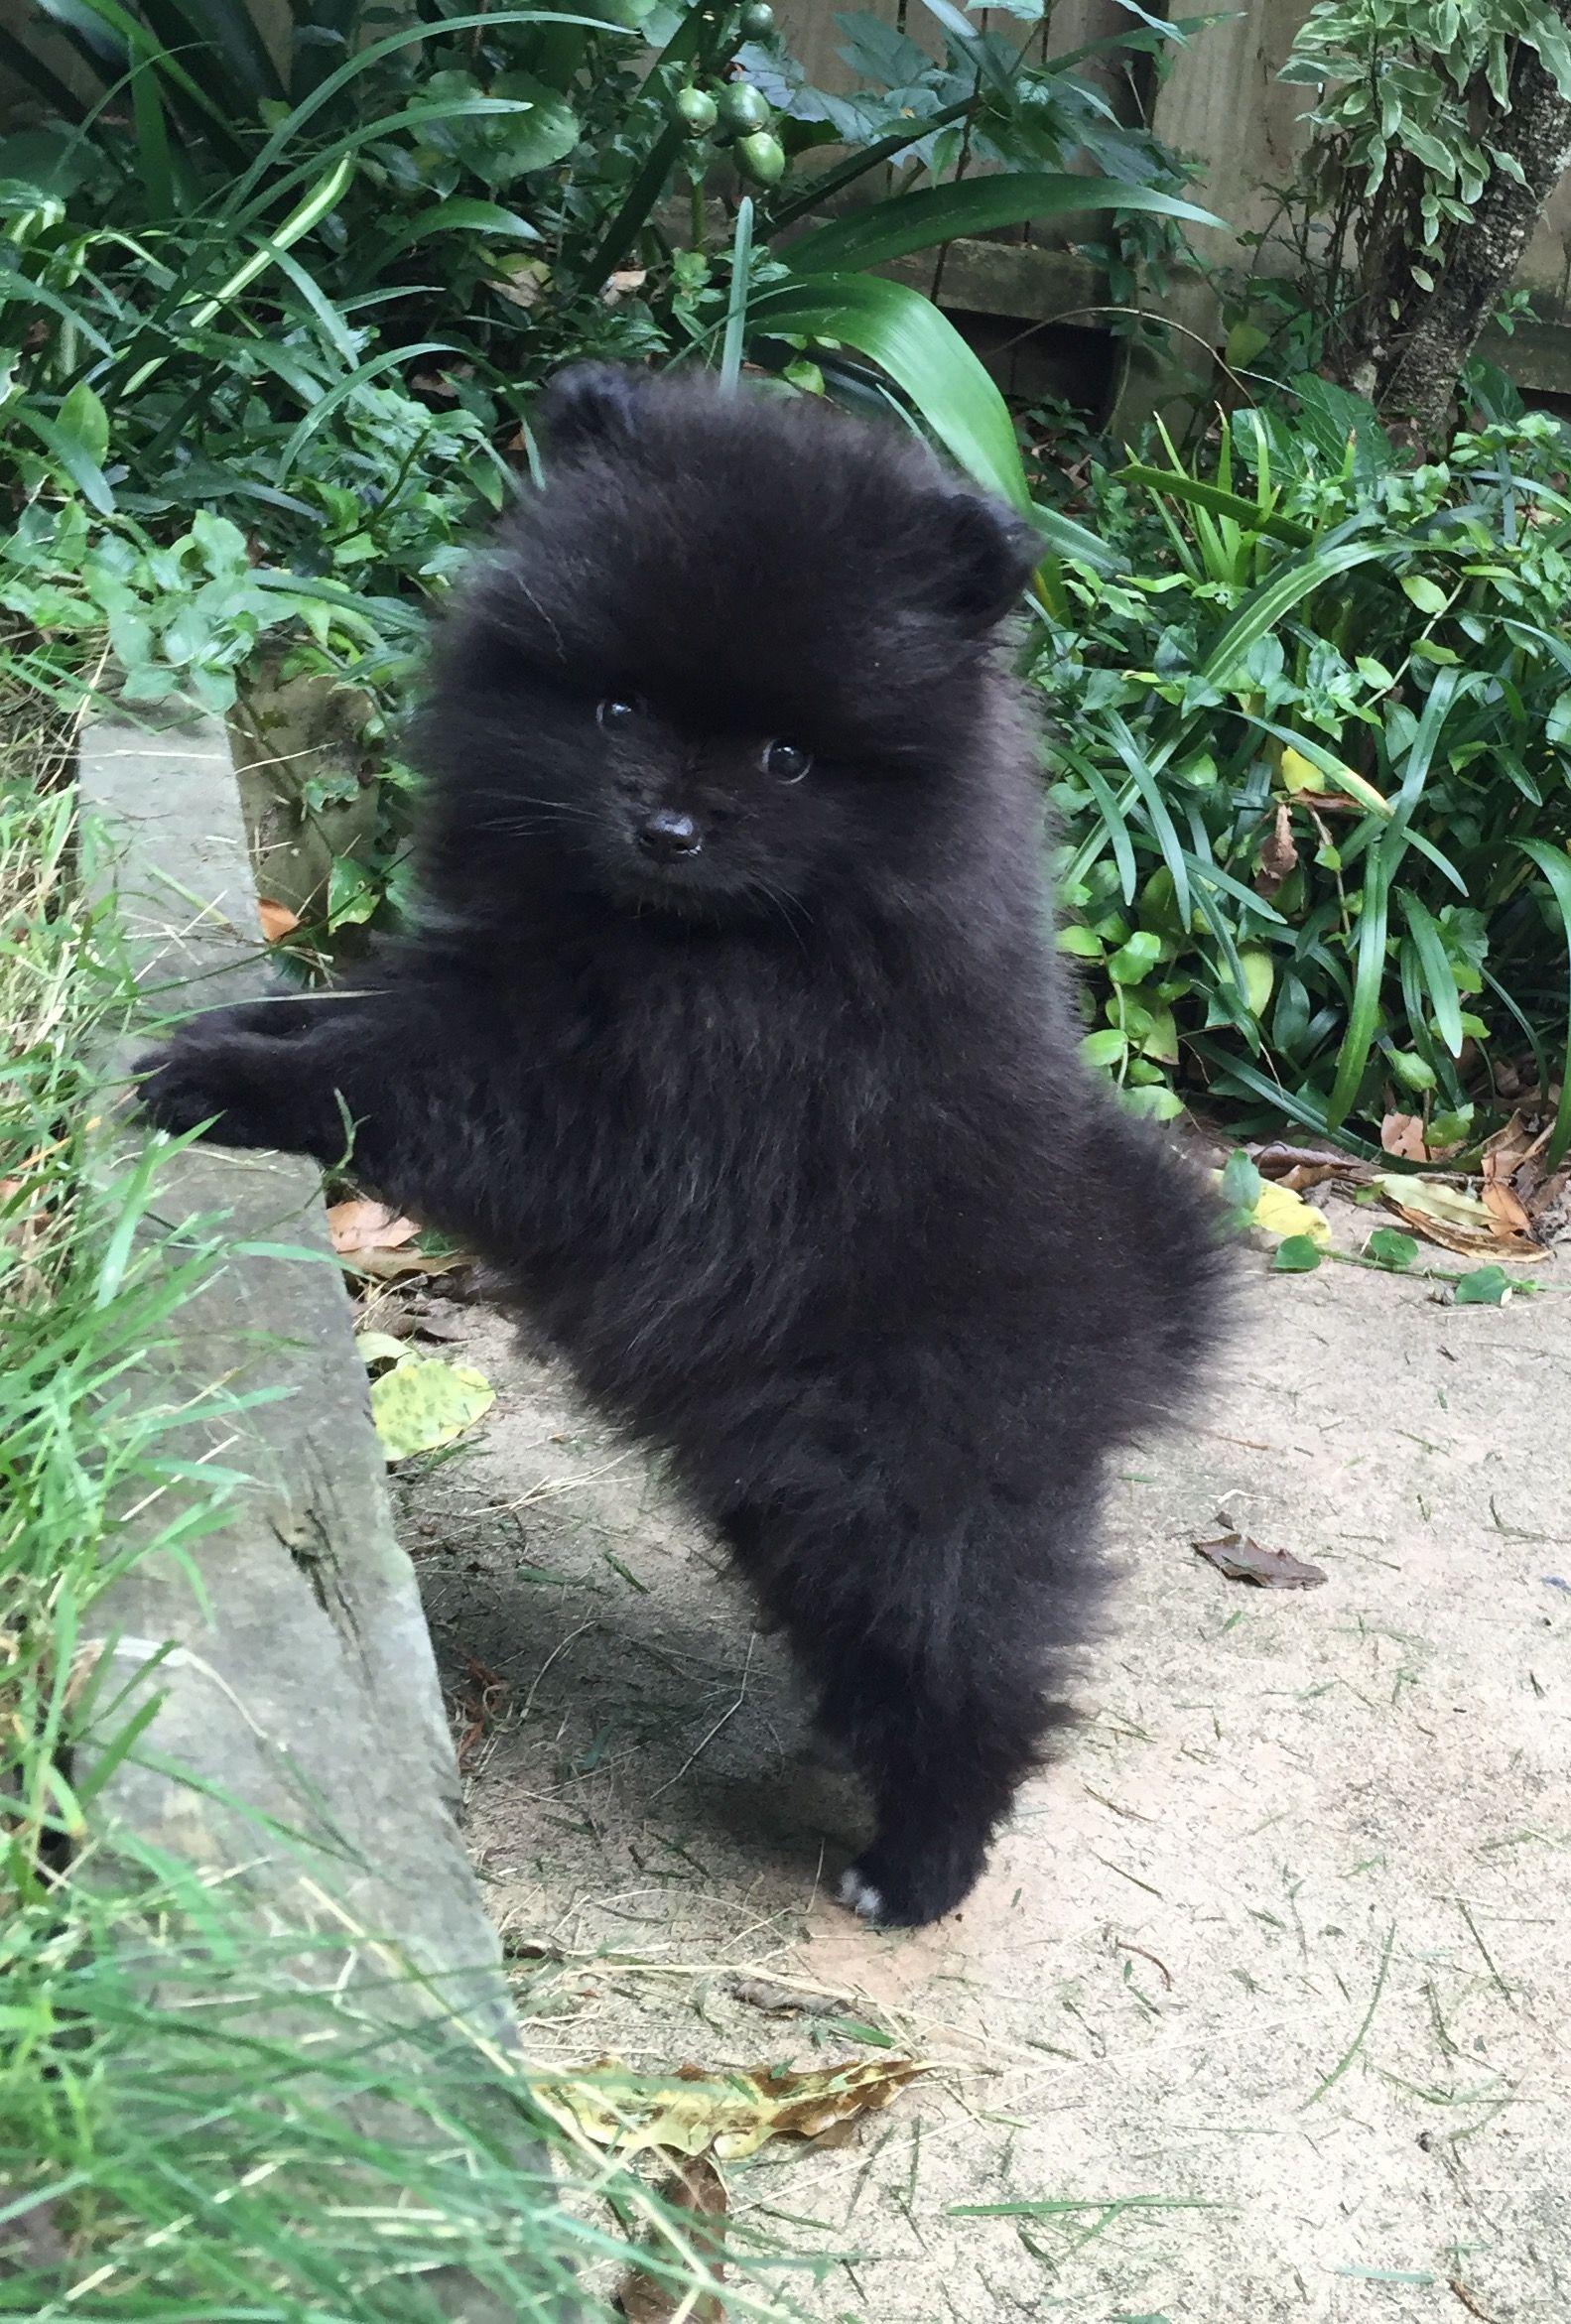 Black Pomeranian Puppy For Sale Near Me : black, pomeranian, puppy, Pomeranian, Puppy,, Black, Puppies,